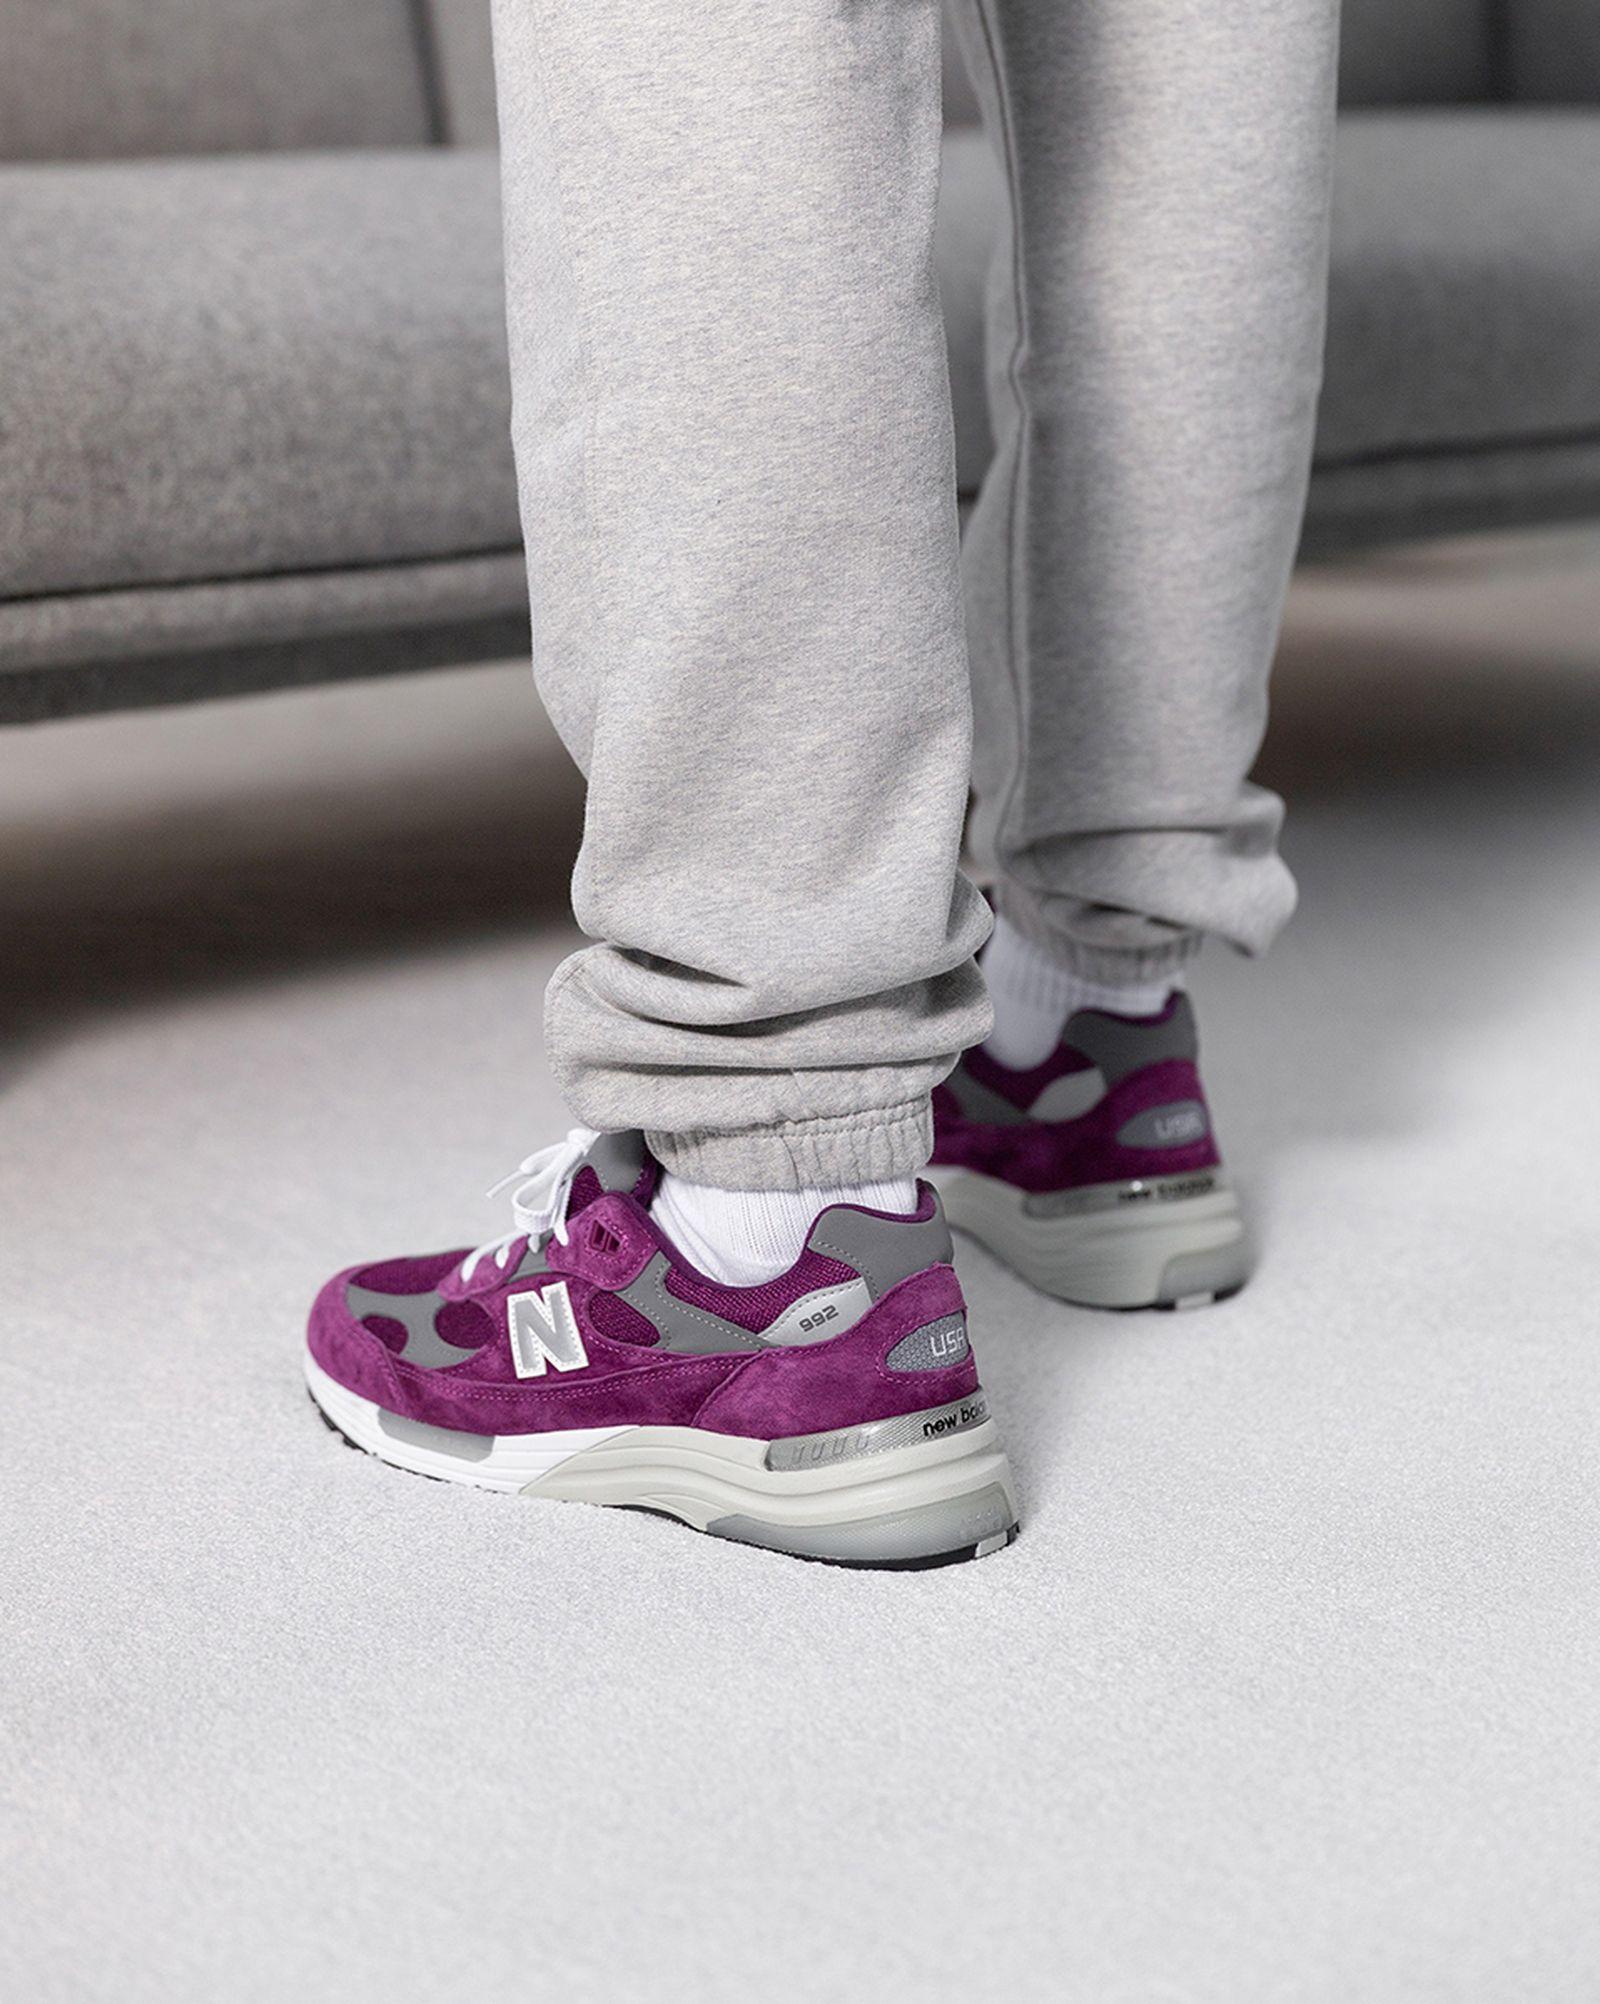 new-balance-992-purple-grey-release-date-price-03